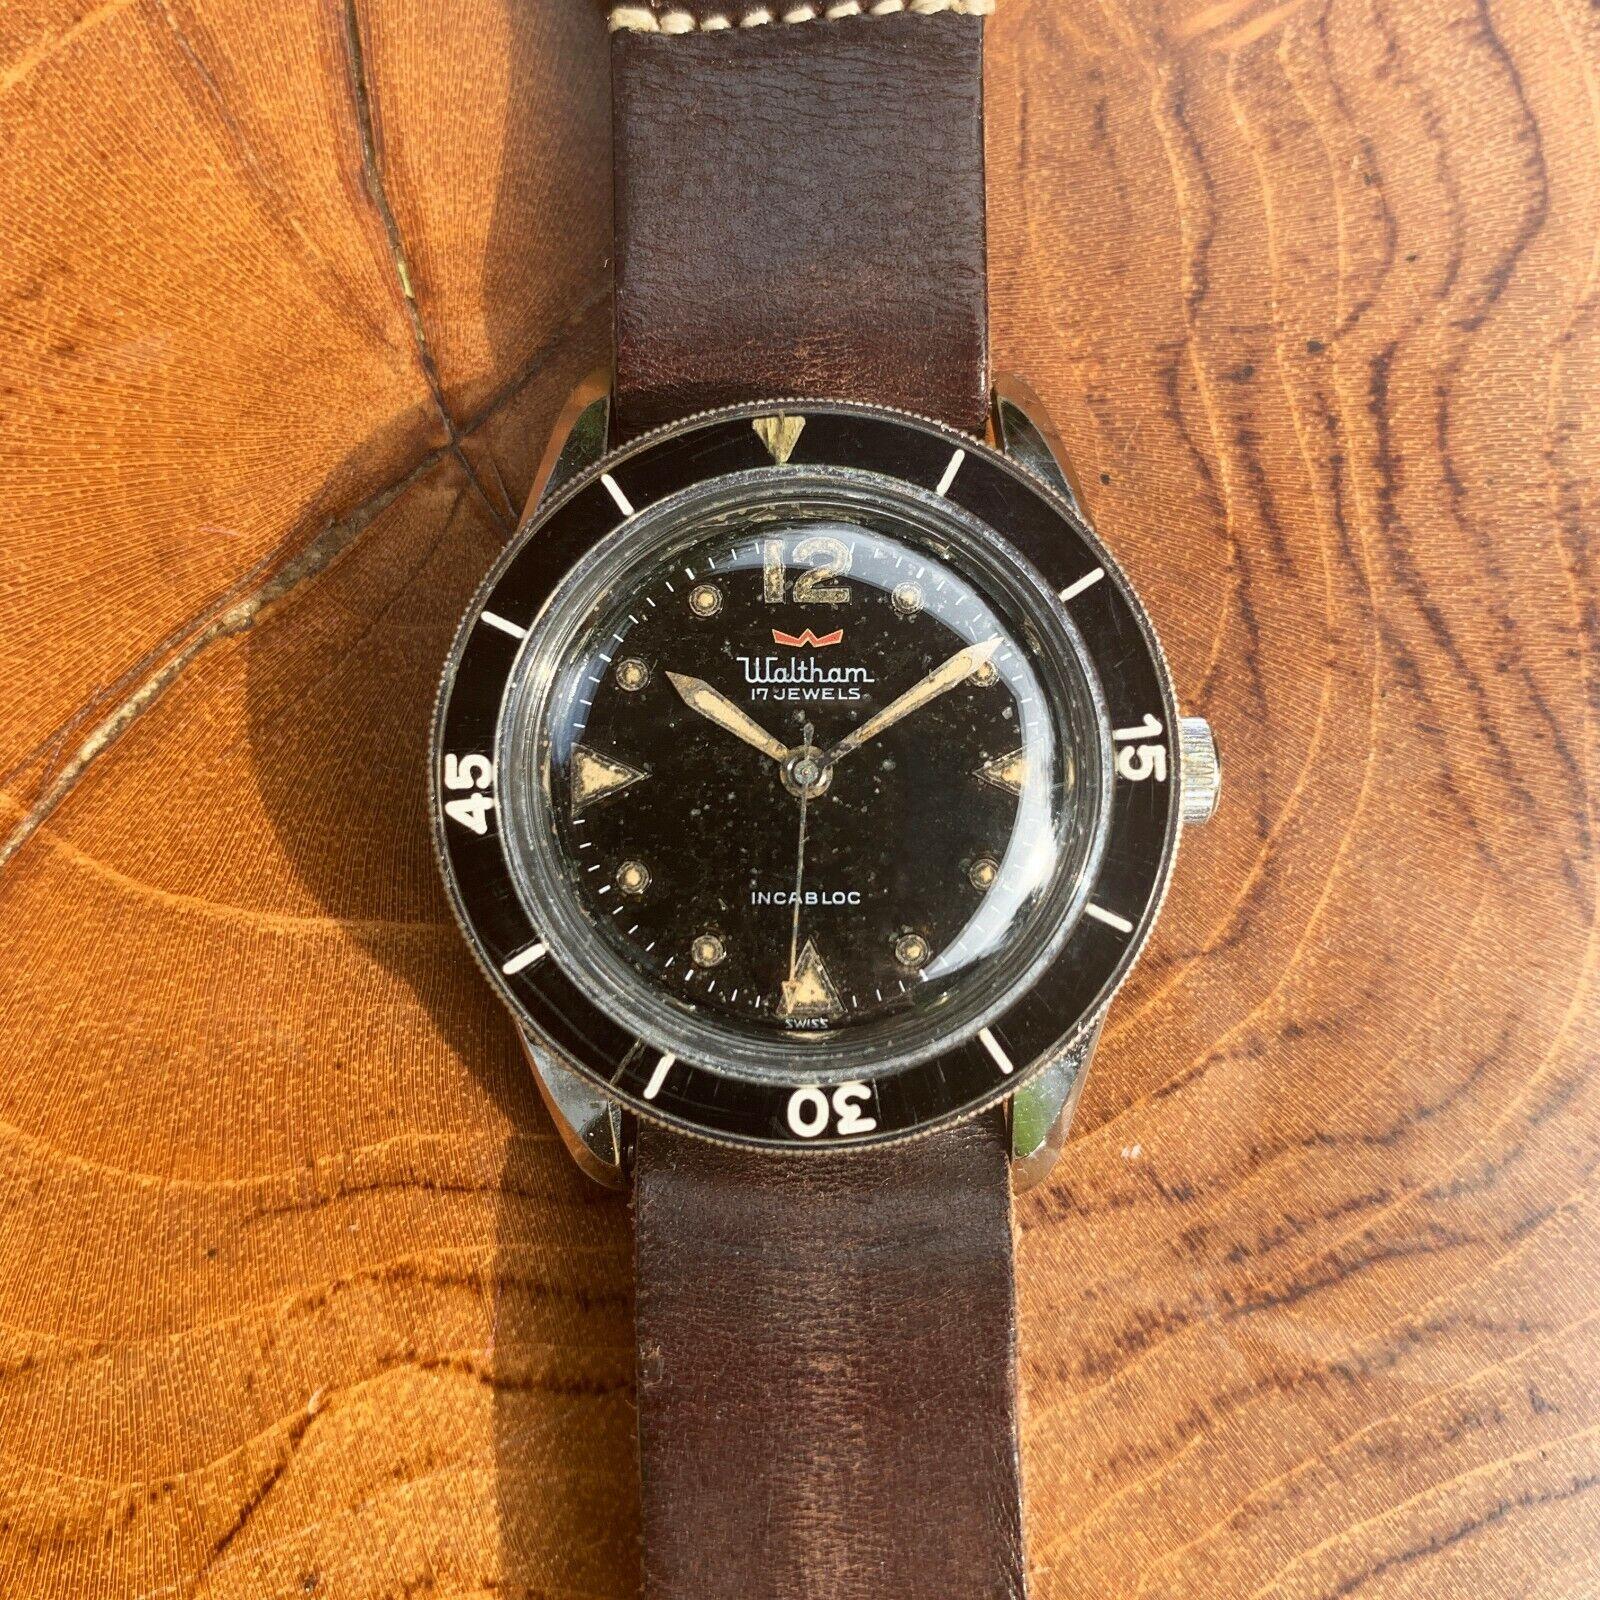 1959 Waltham (Blancpain) Bathyscaphe MC4 Vintage Dive Watch - watch picture 1